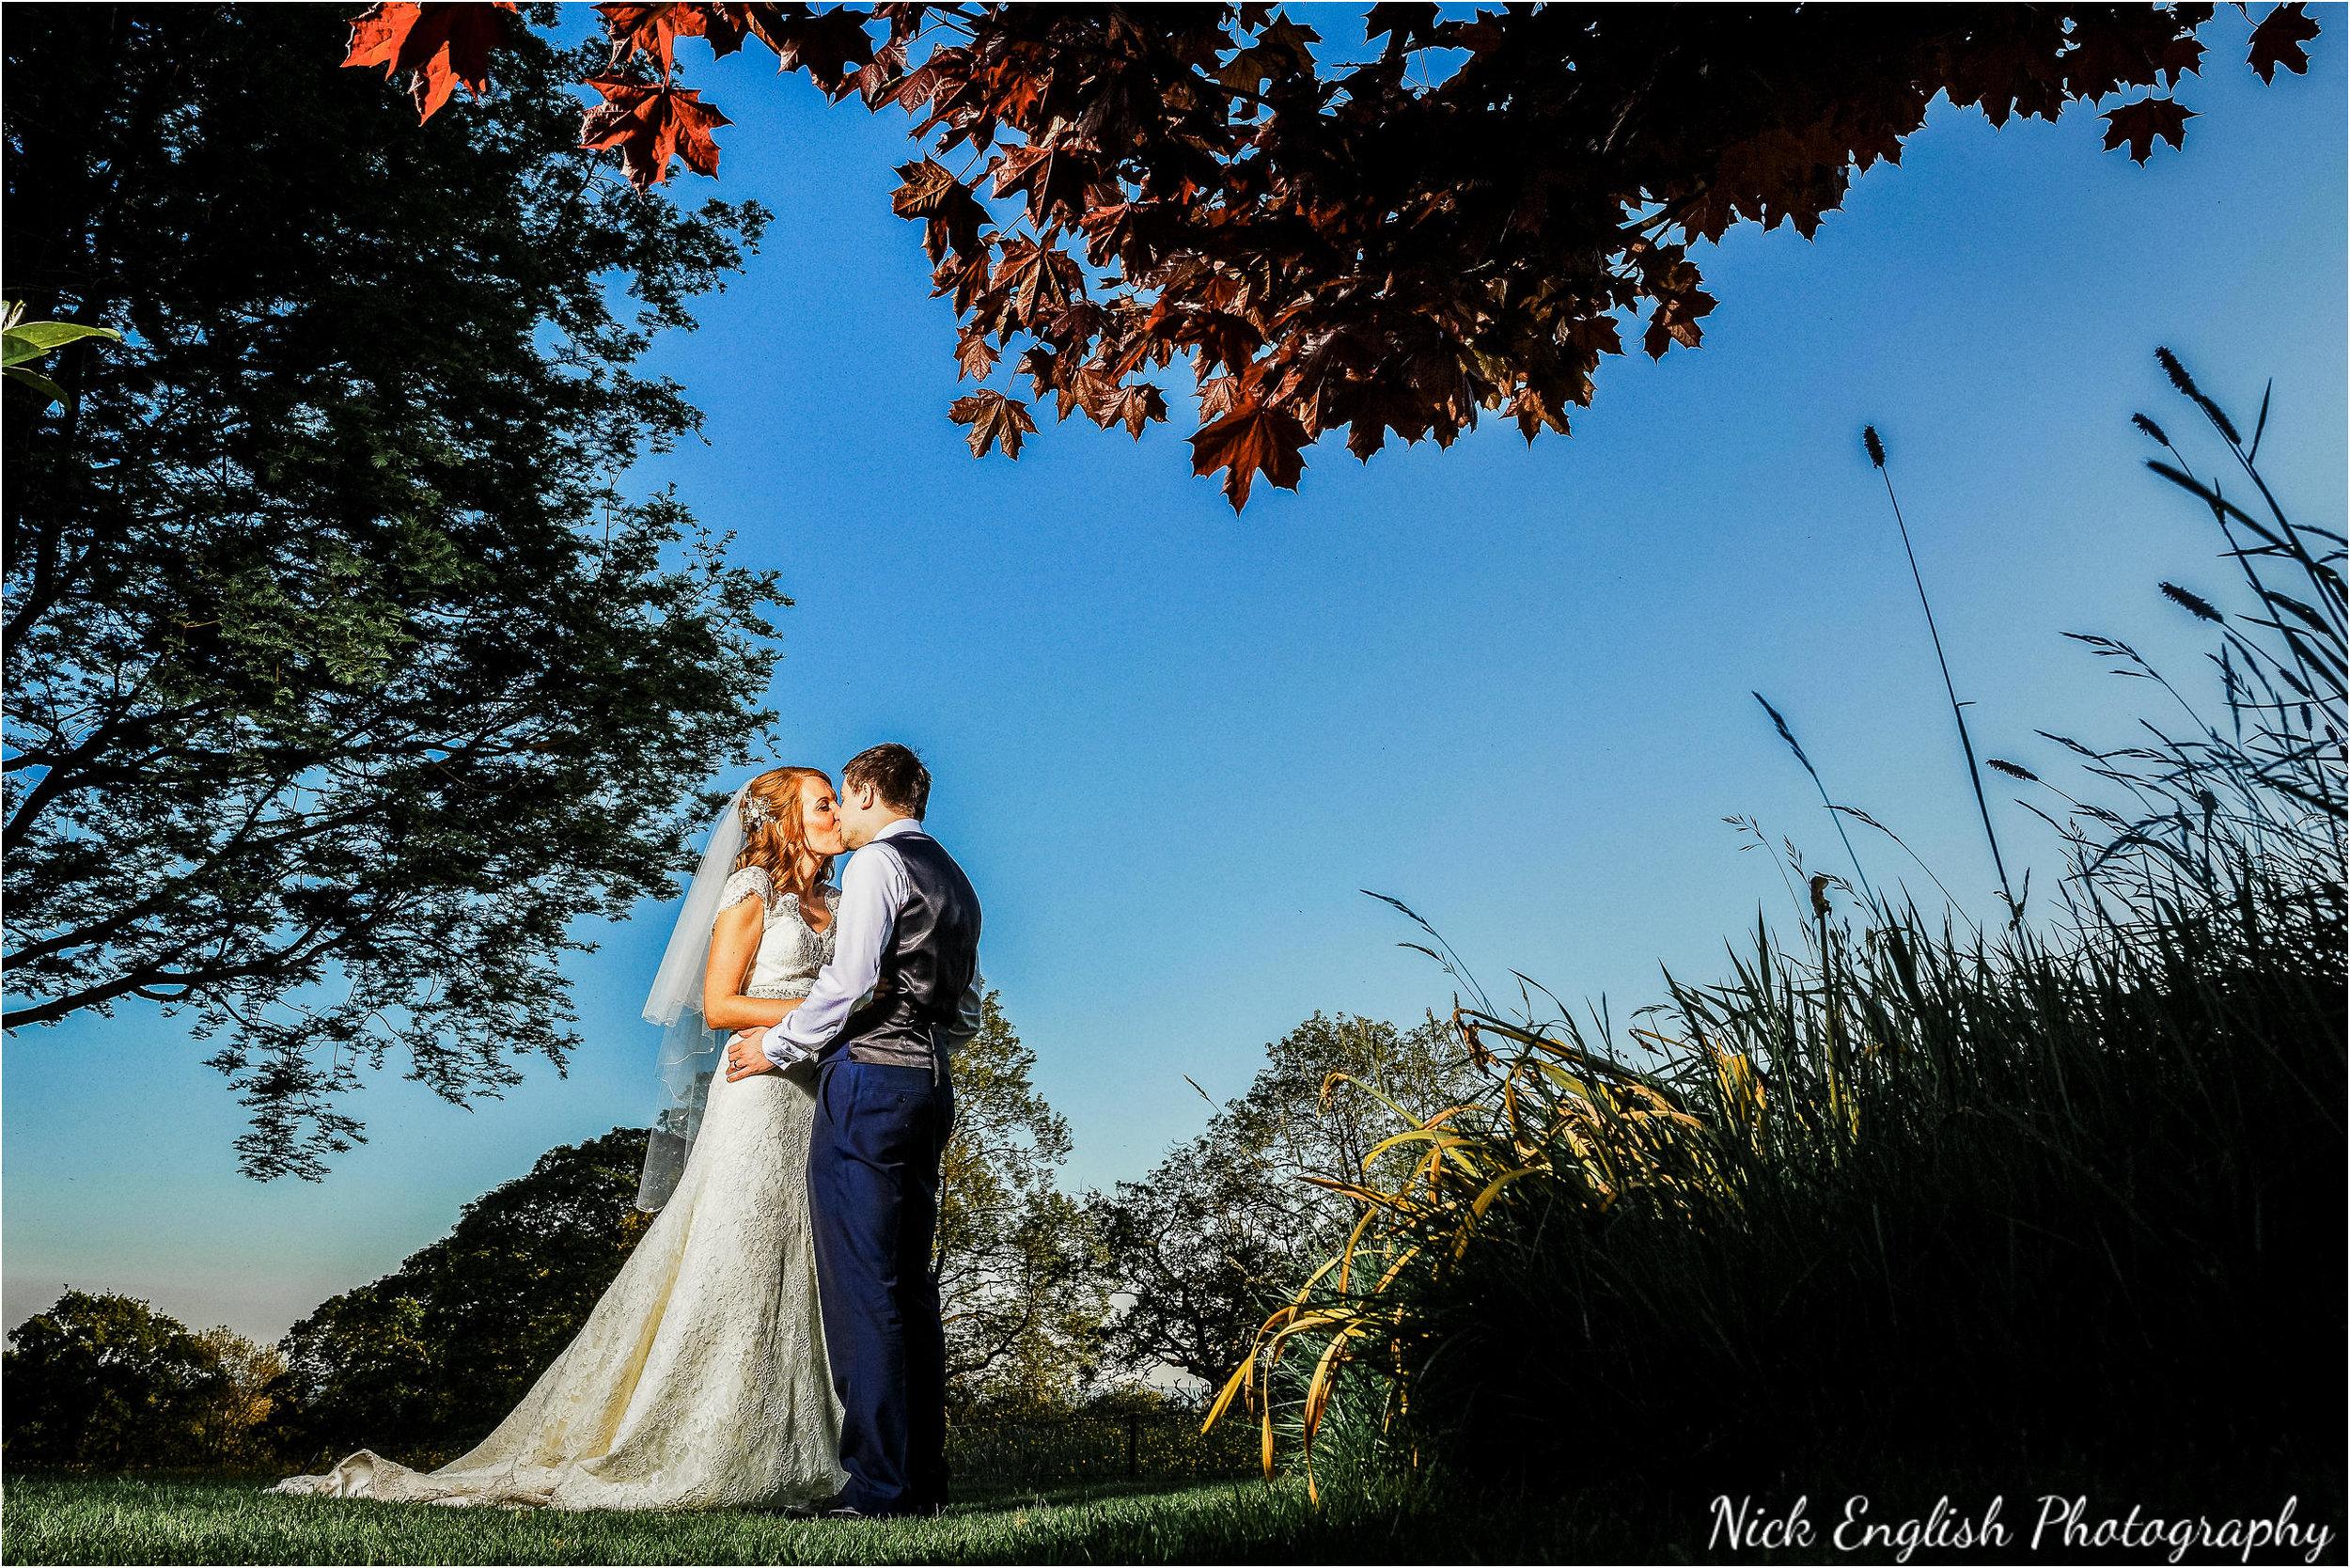 Alison James Wedding Photographs at Eaves Hall West Bradford 223jpg.jpeg